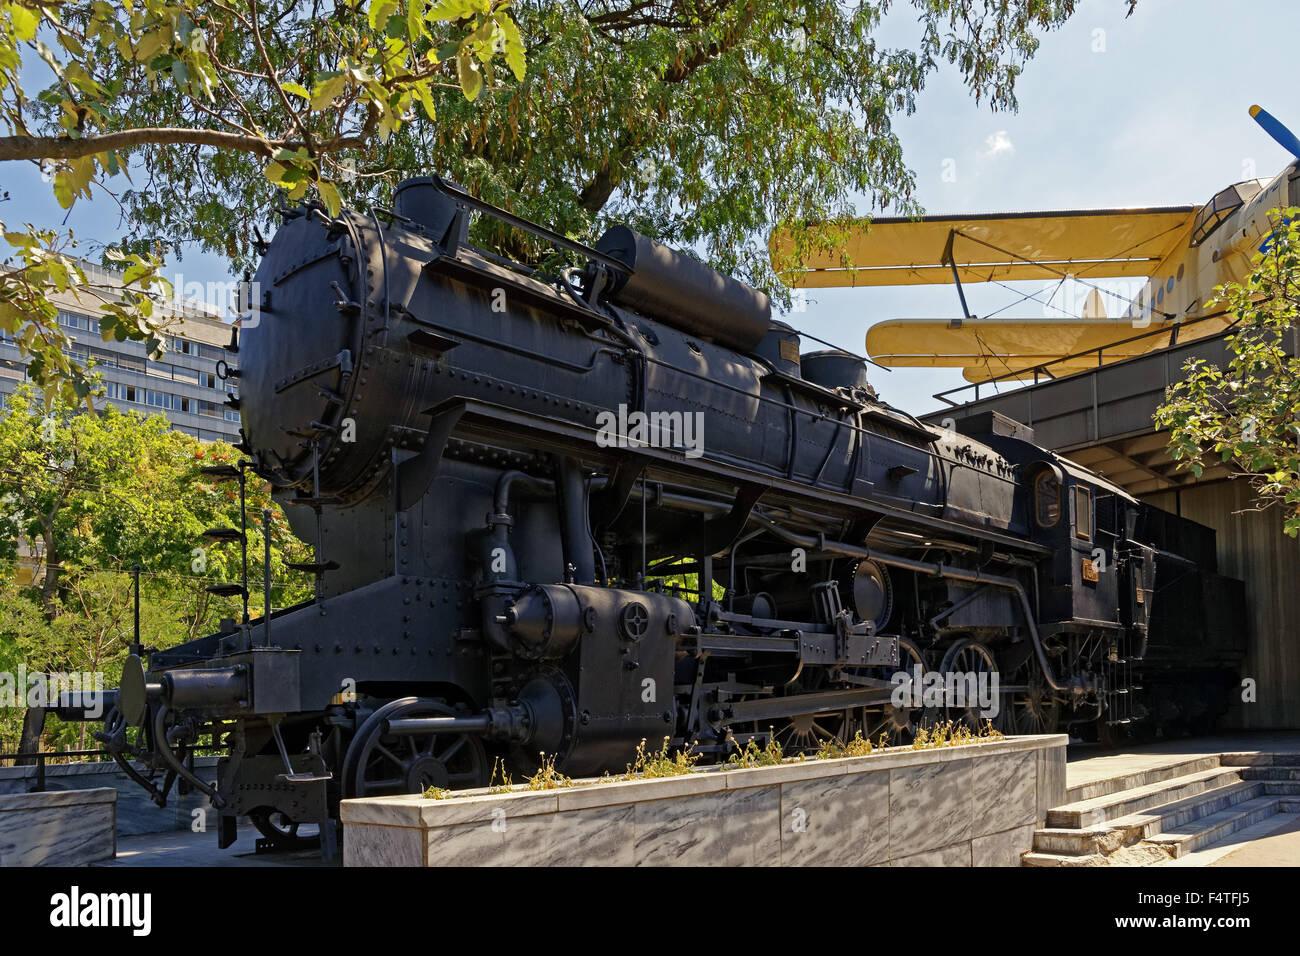 National technical museum, traffic museum, Magyar Muszaki es Közlekedesi Muzeum, steam locomotive - Stock Image